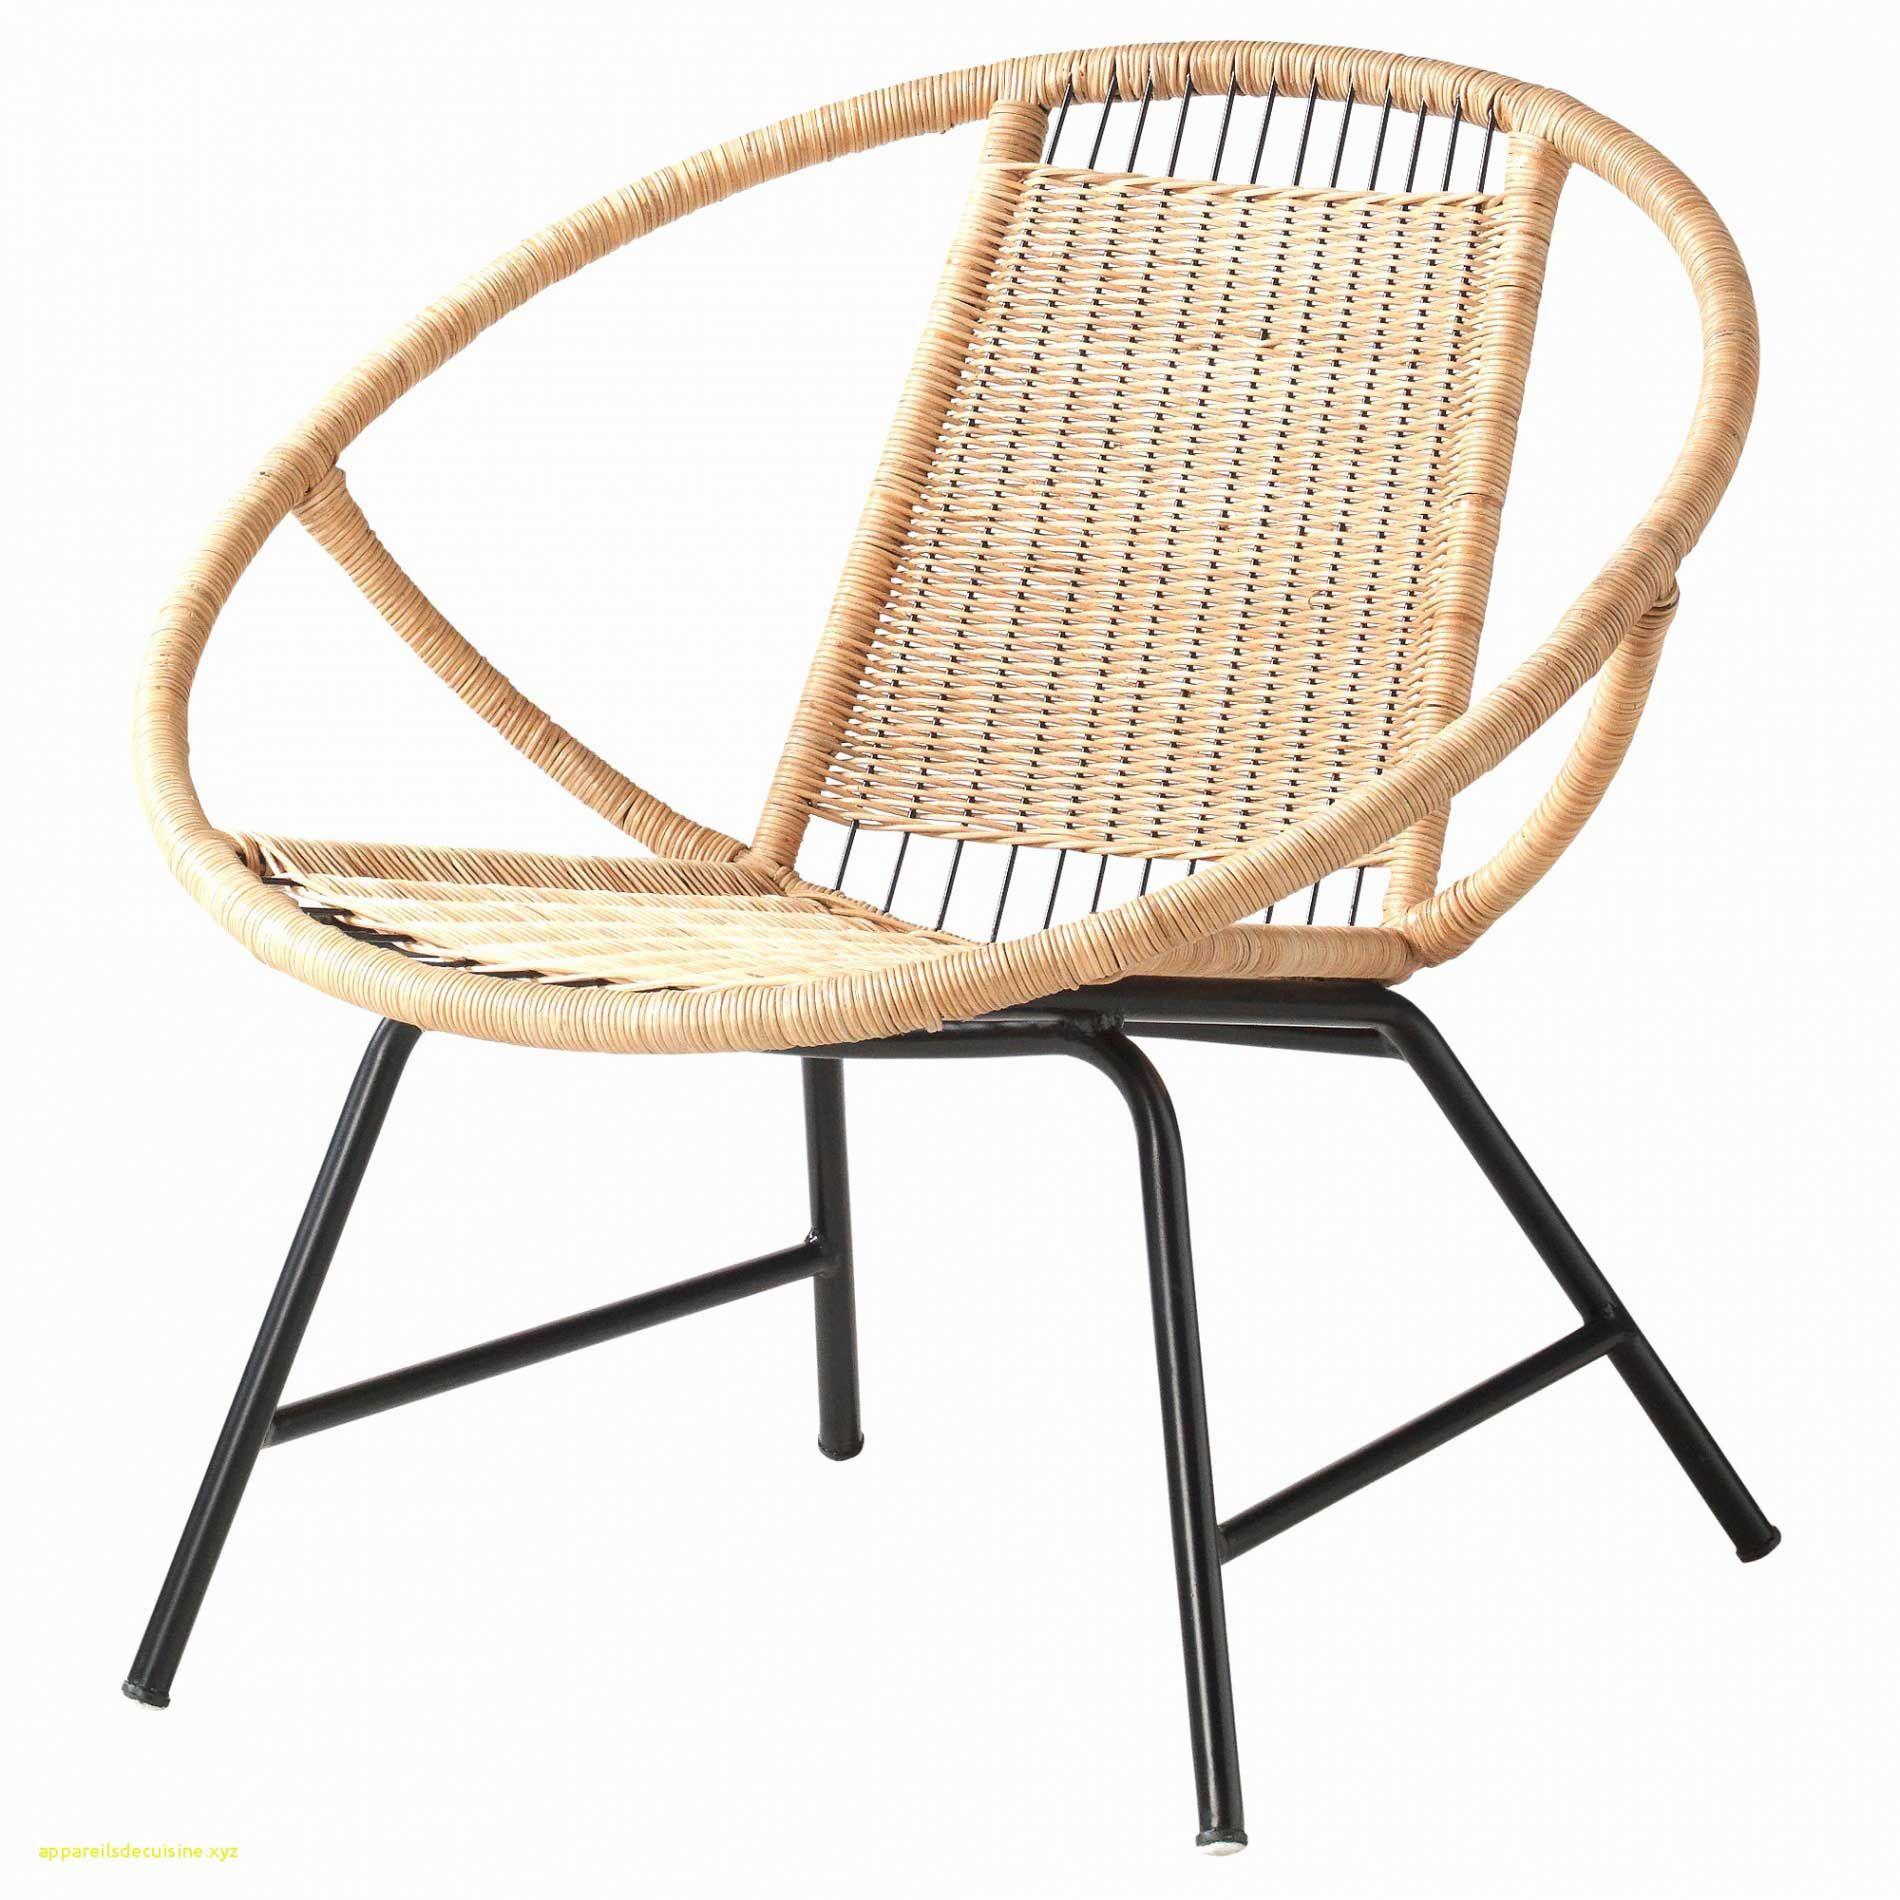 Resultat Superieur Chaise En Rotin Pas Cher Impressionnant 60 Fauteuil Osier Blanc Fauteuil O In 2020 Rattan Chair Rattan Armchair Chair